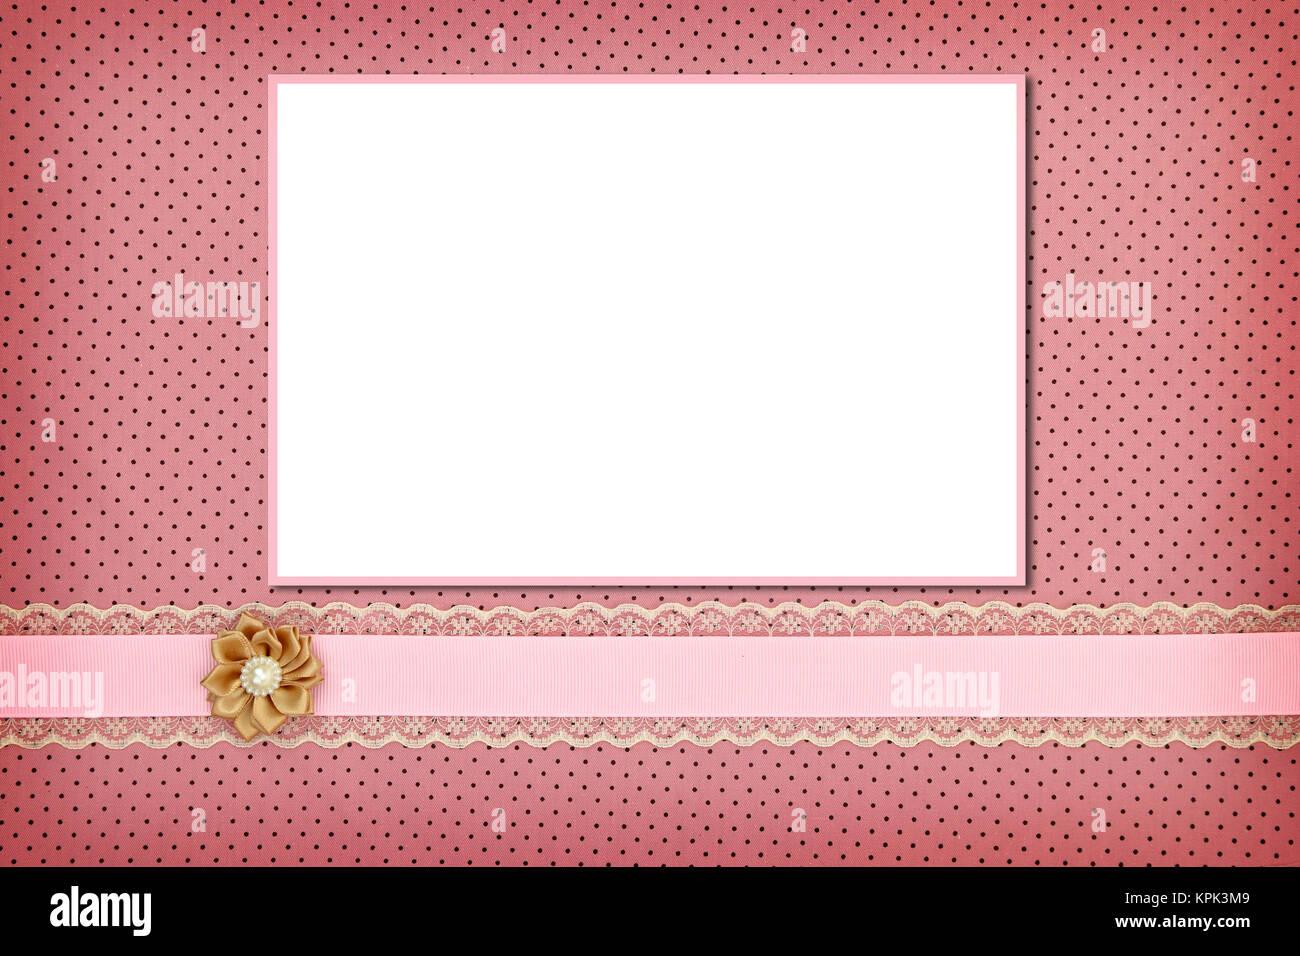 Photo frame on pink polka dot background Stock Photo: 168835753 - Alamy